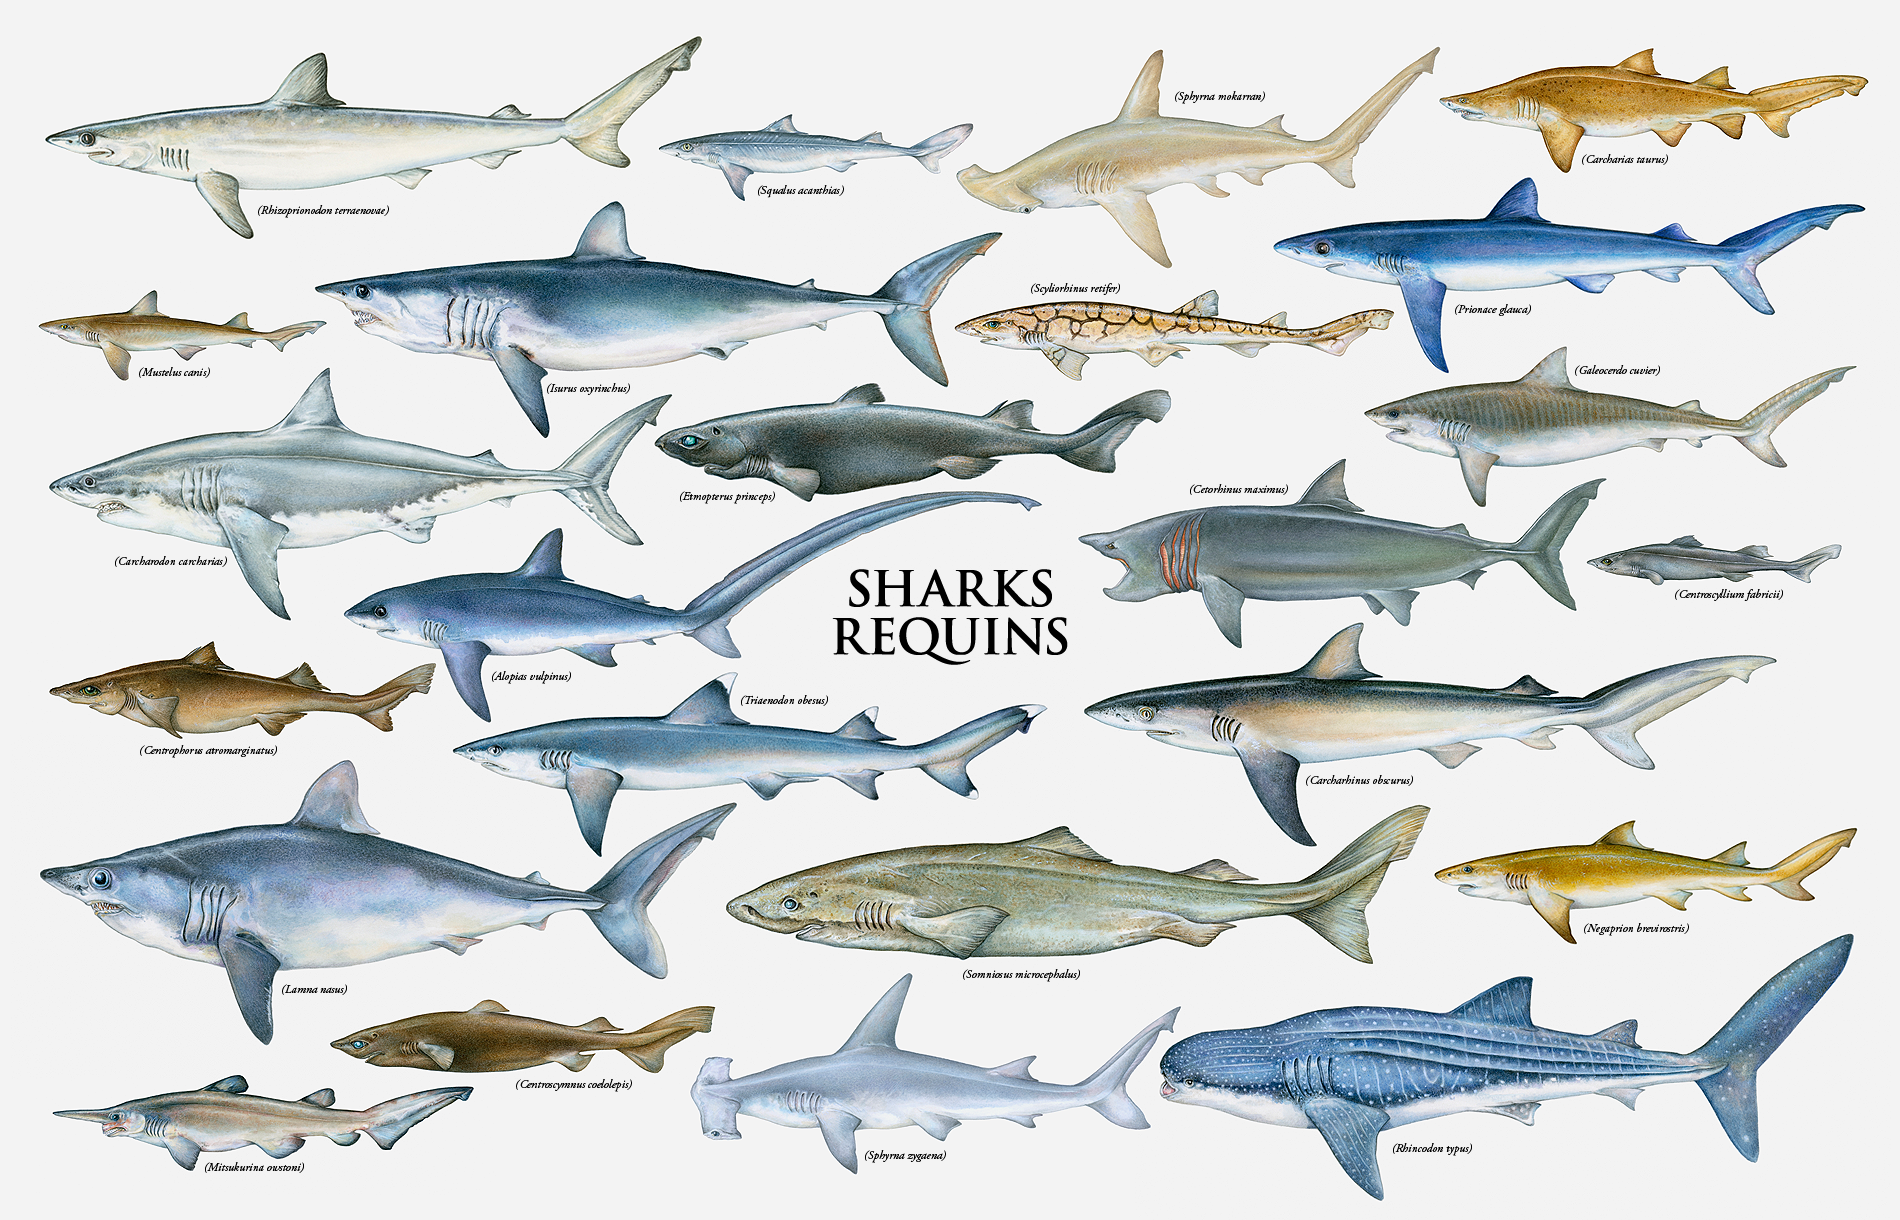 toolbar creator galleries related shark species chart shark species ... Shark Species Chart